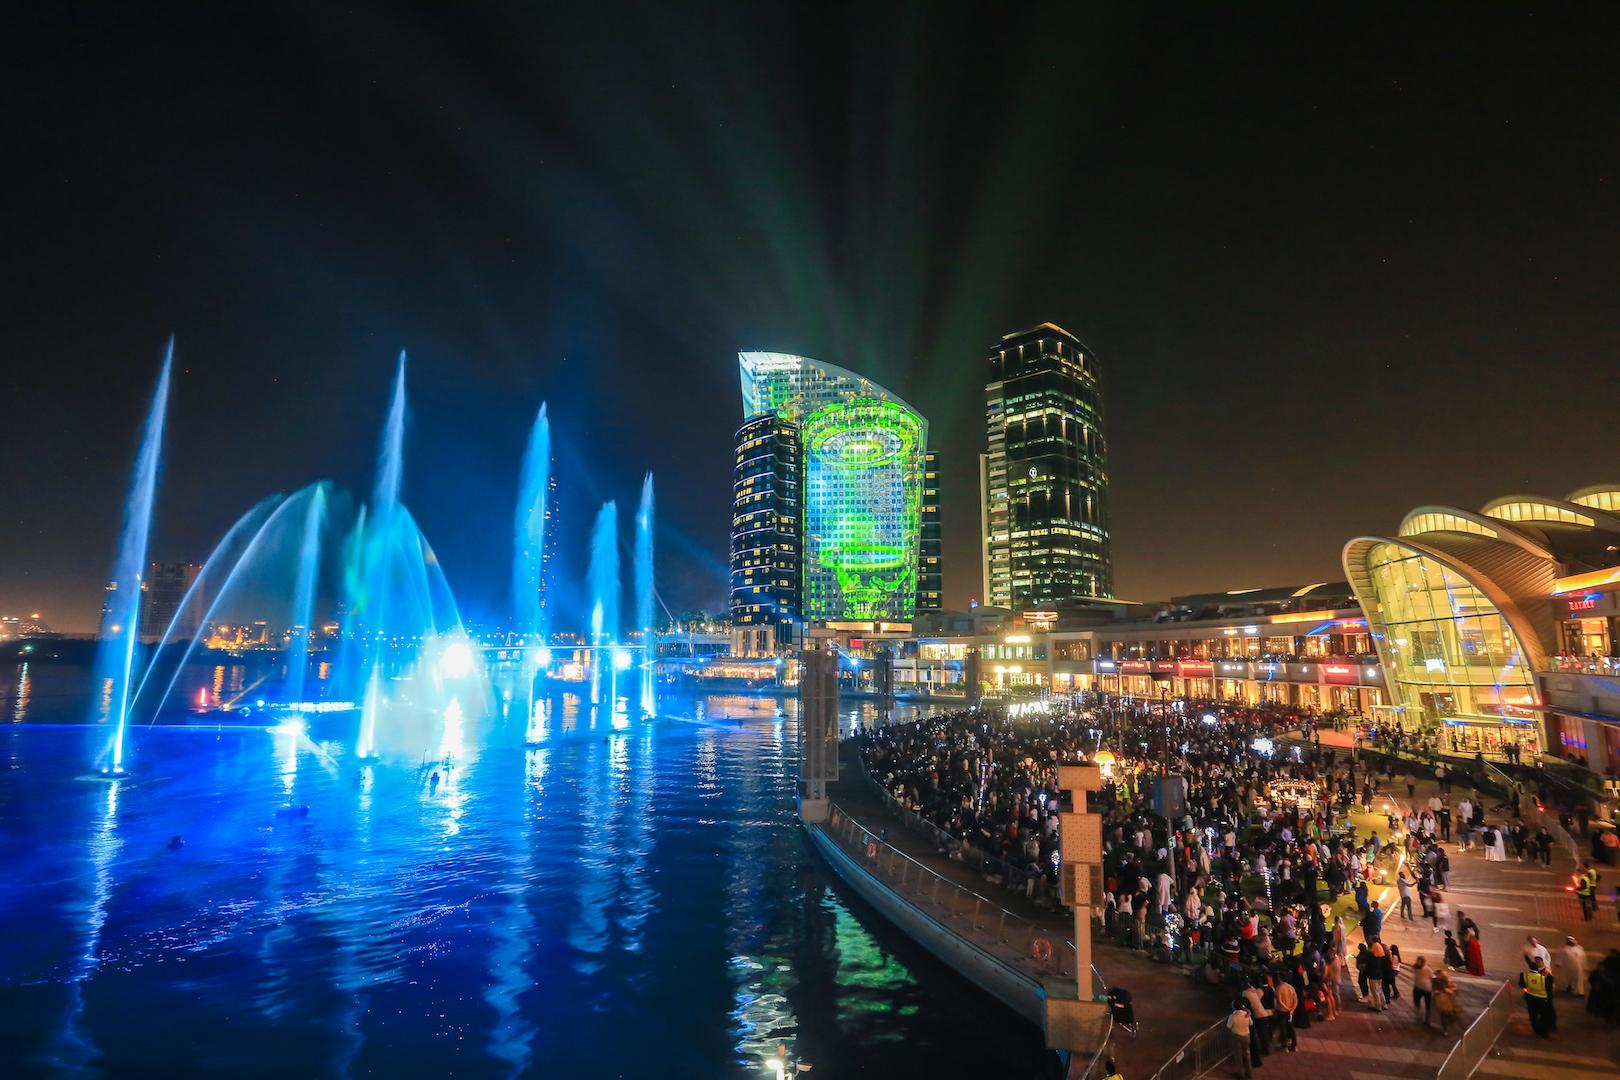 Dubai Shopping Festival 2019 at Dubai Festival City Mall